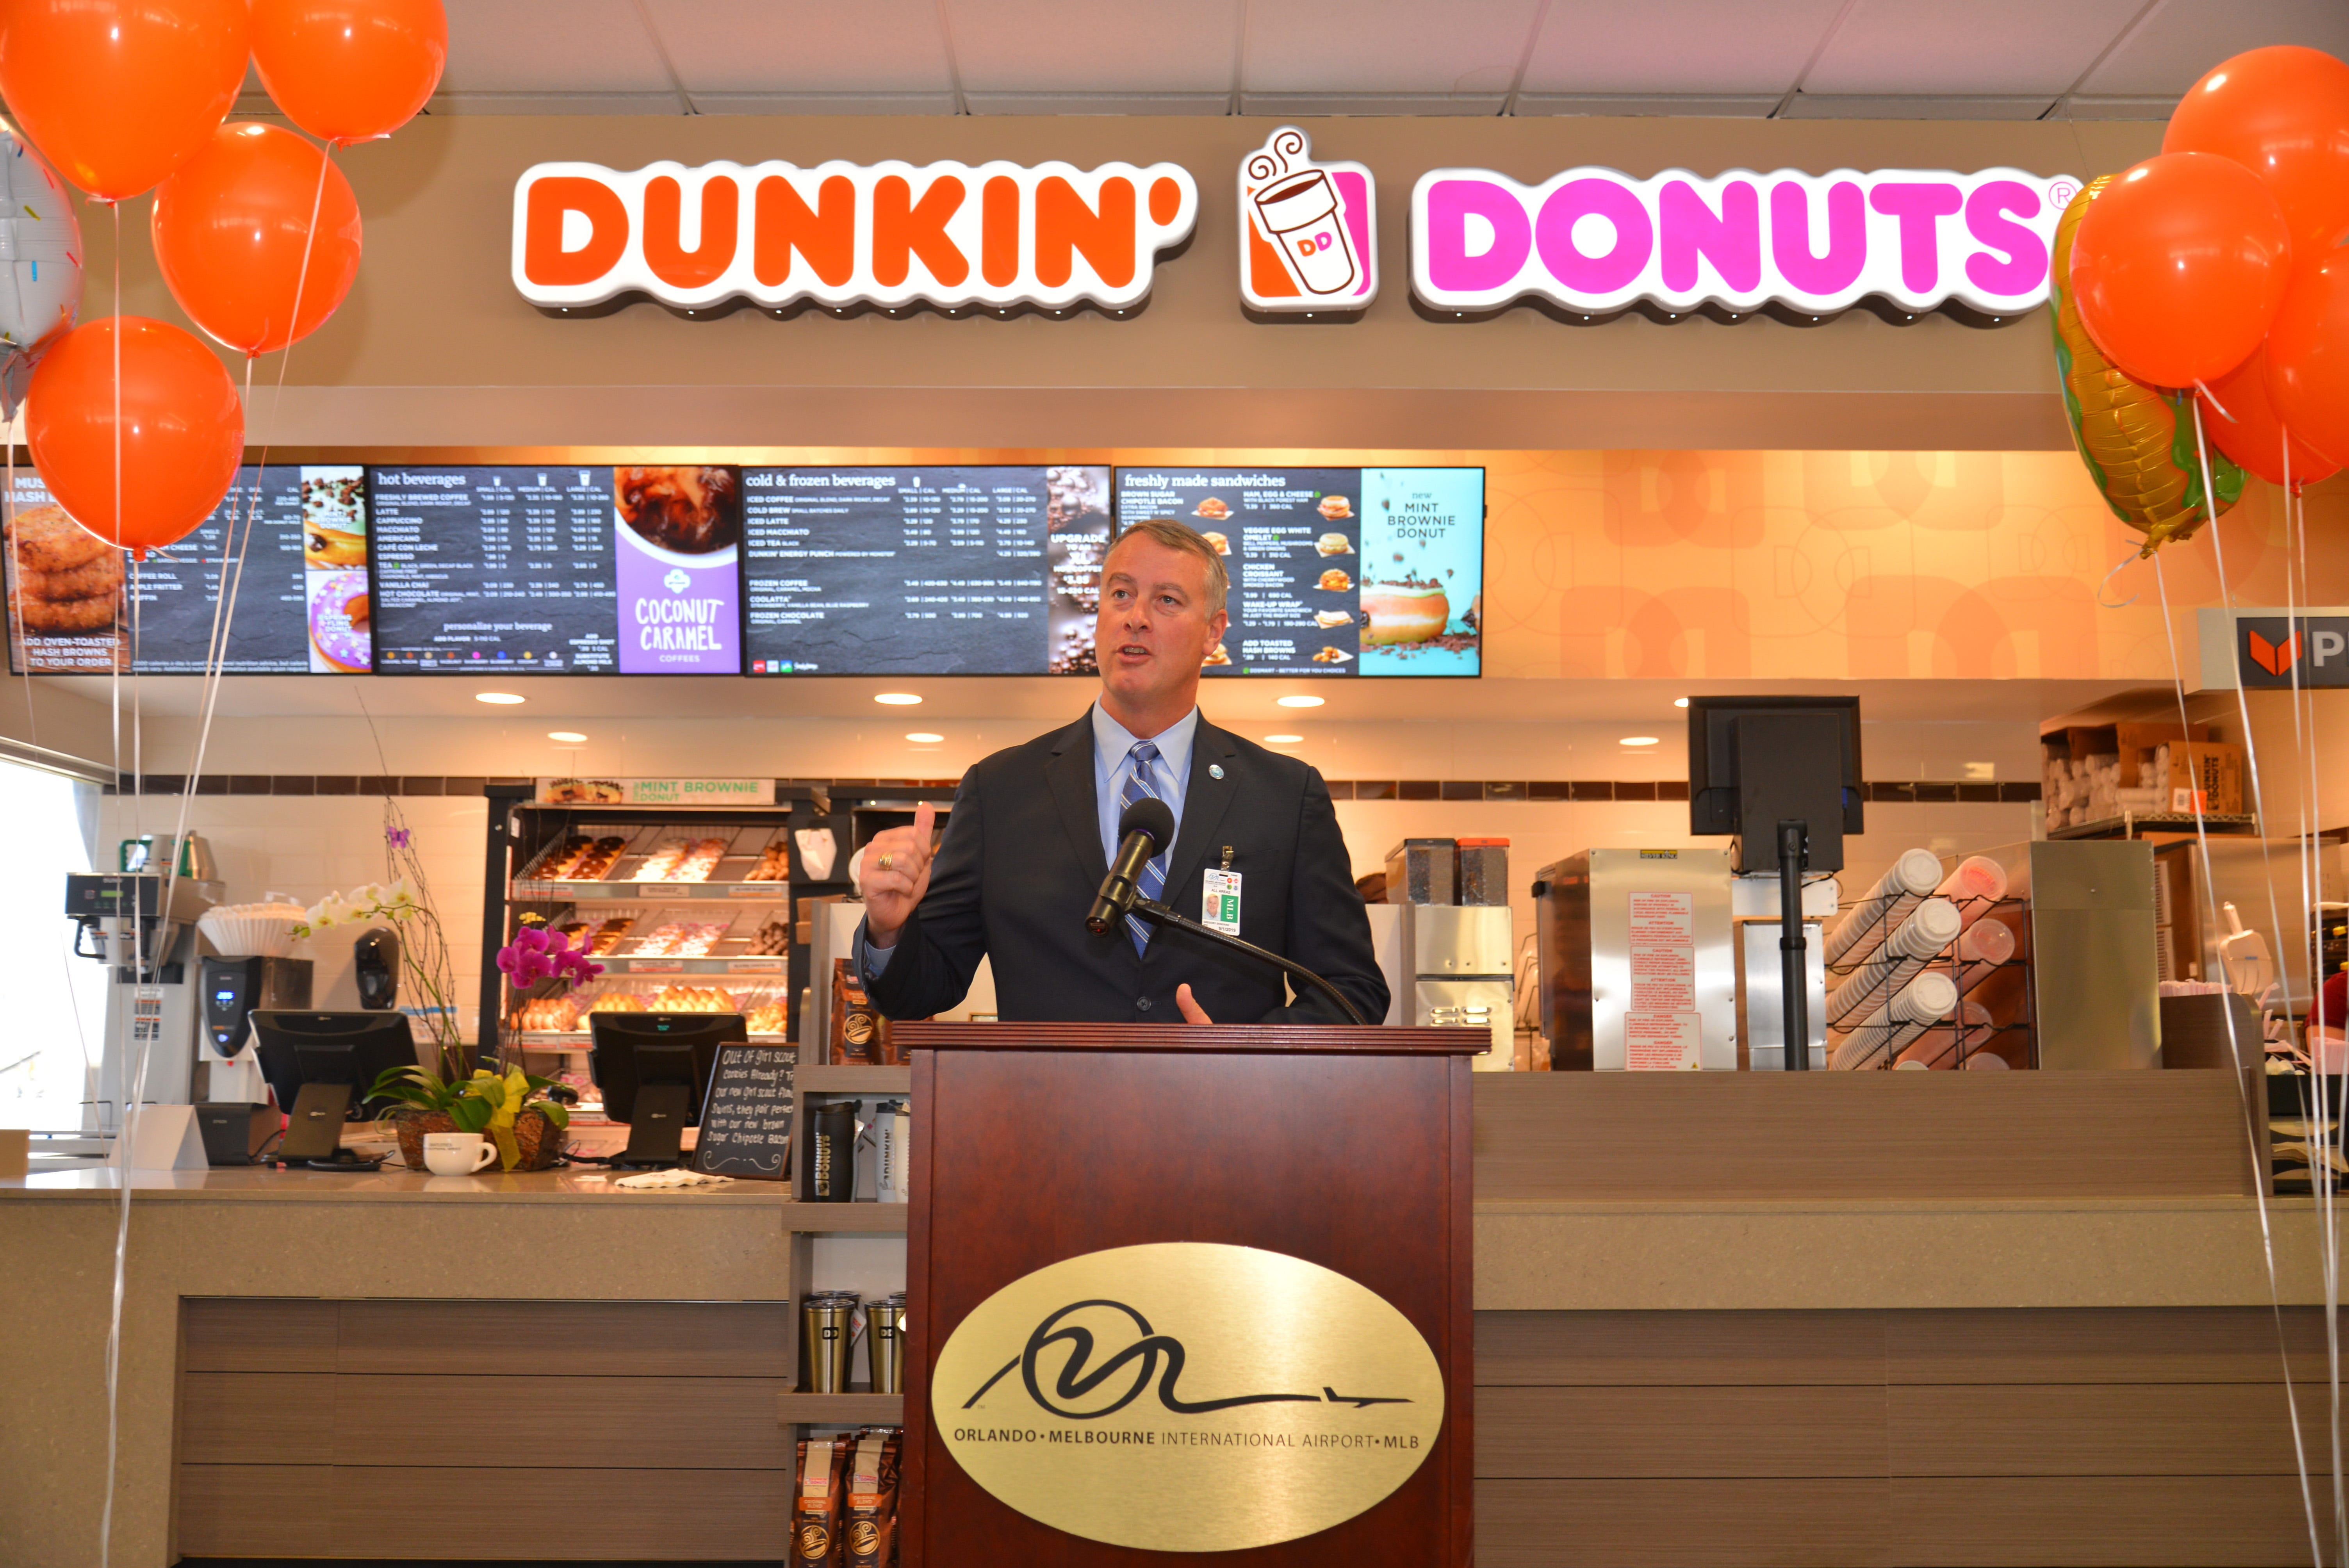 636572441846861023-donut1 Orlando Melbourne International gets tasty addition